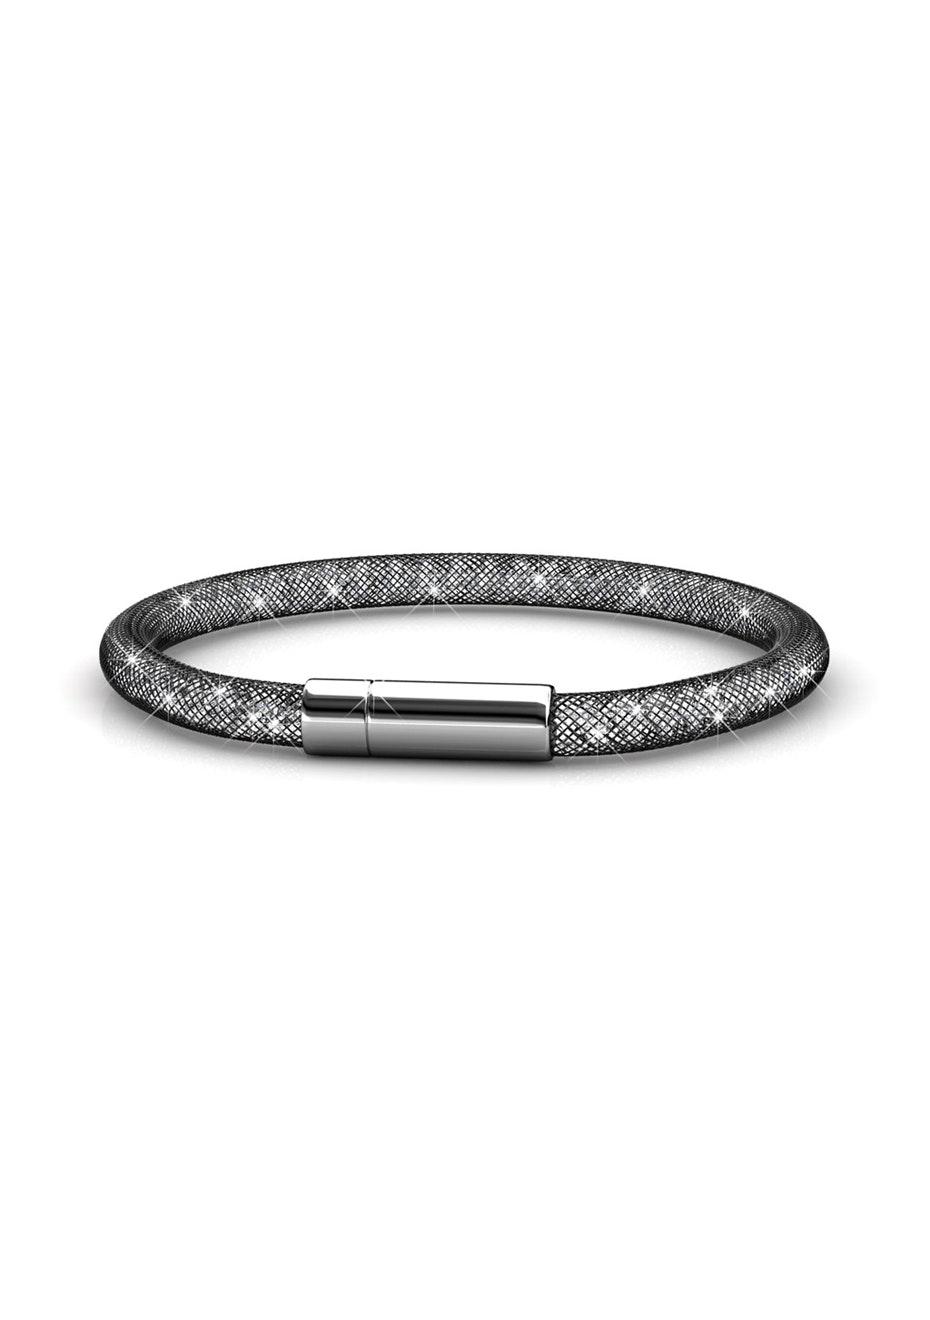 Mesh Single Wrap Bracelet Ft Swarovski Crystals -Black